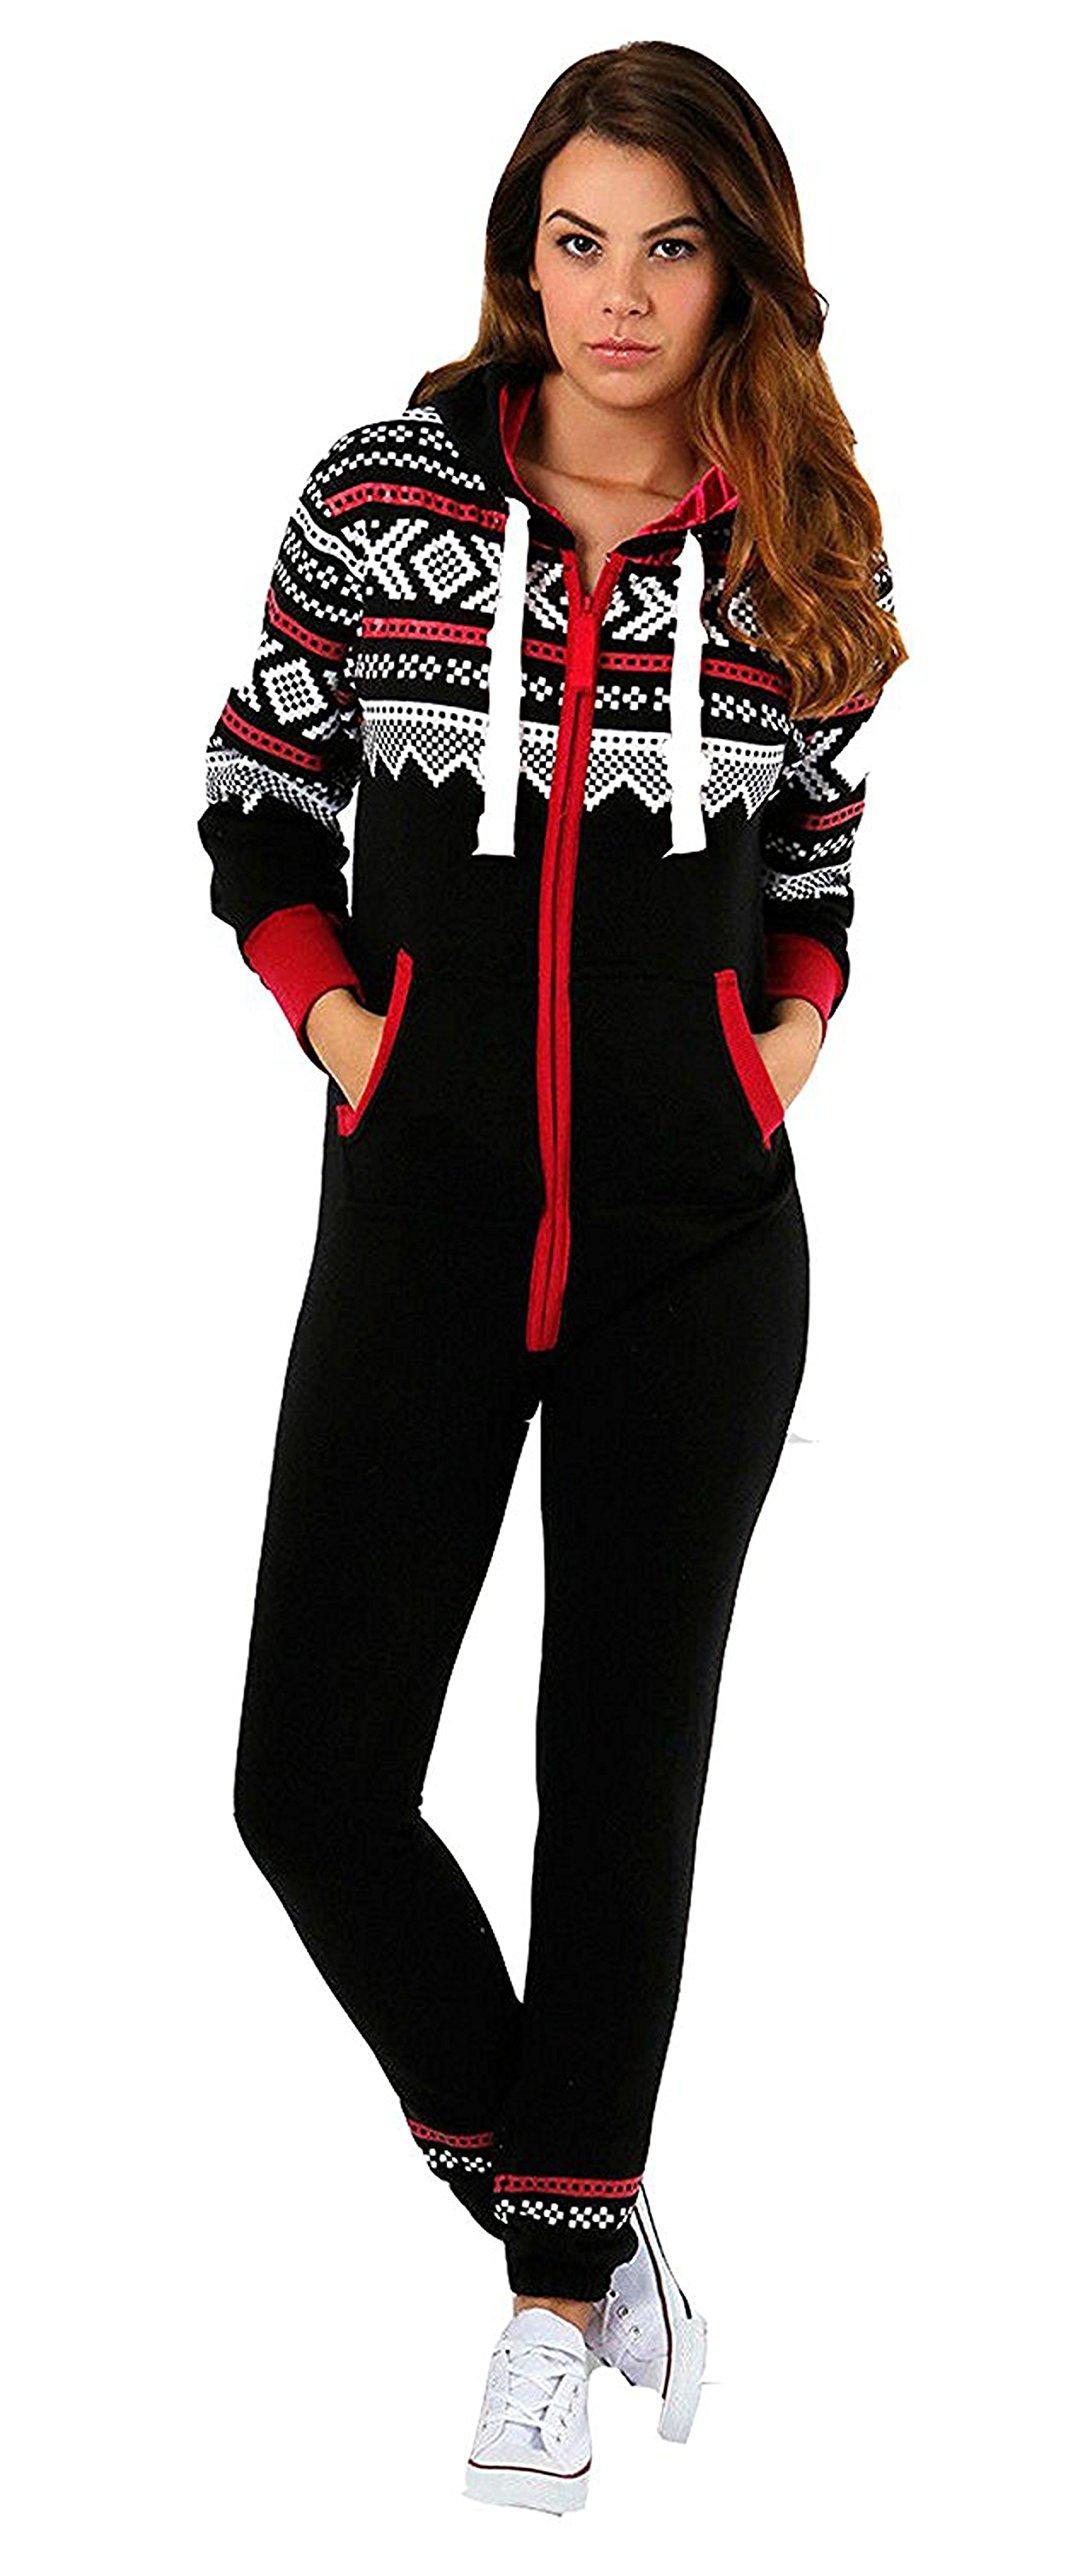 Juicy Trend Mujer Adulto Onesie Ropa de dormir Pijamas OnePiece - Mono para Mujer product image